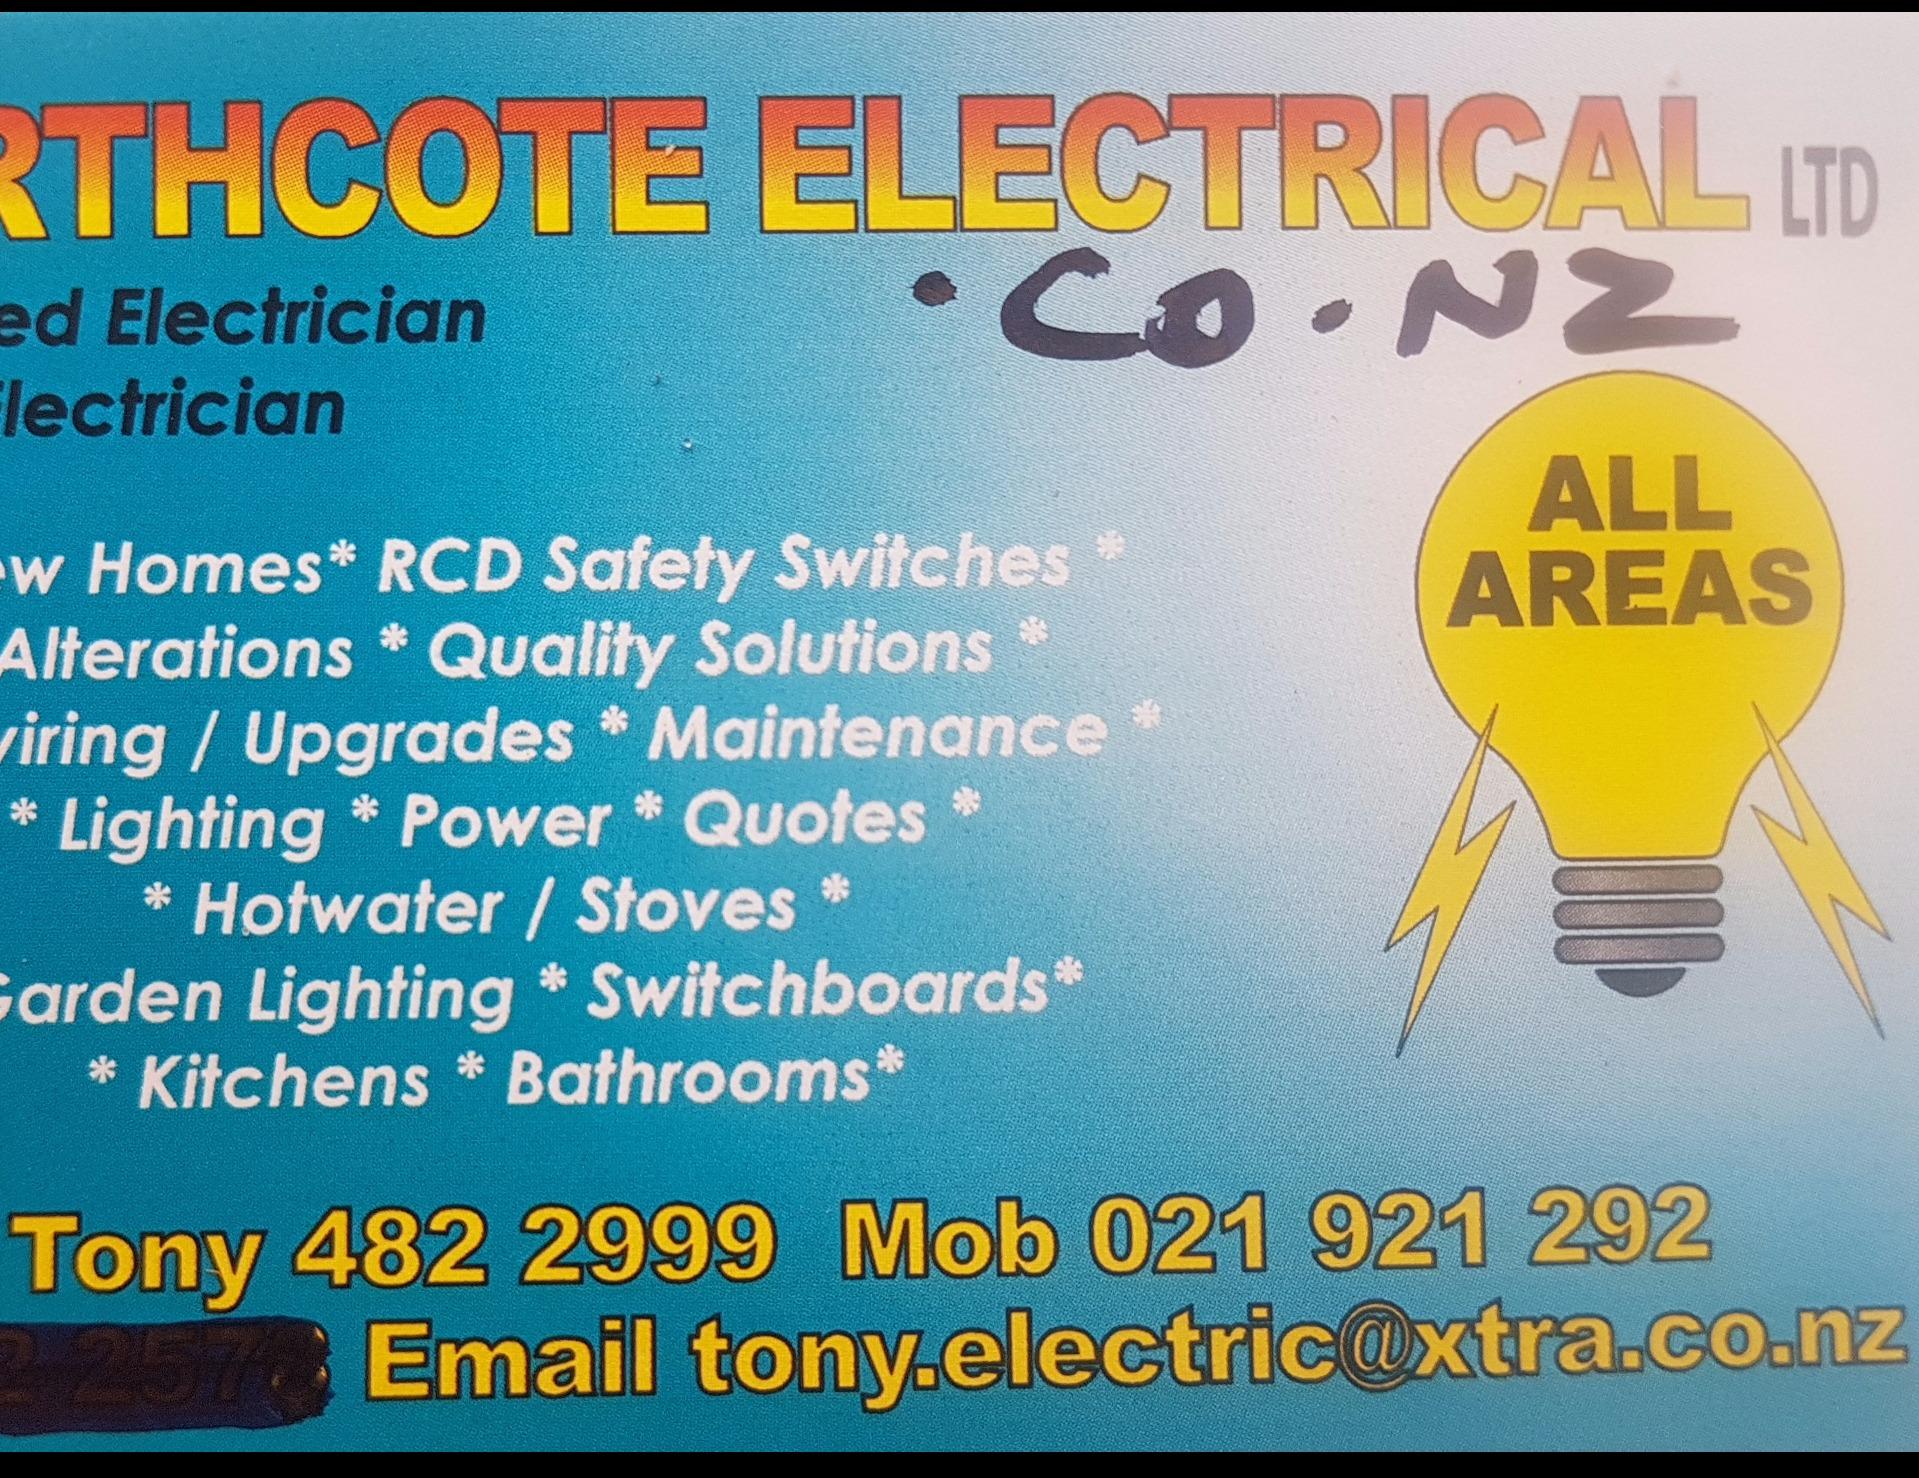 Northcote Electrical Ltd